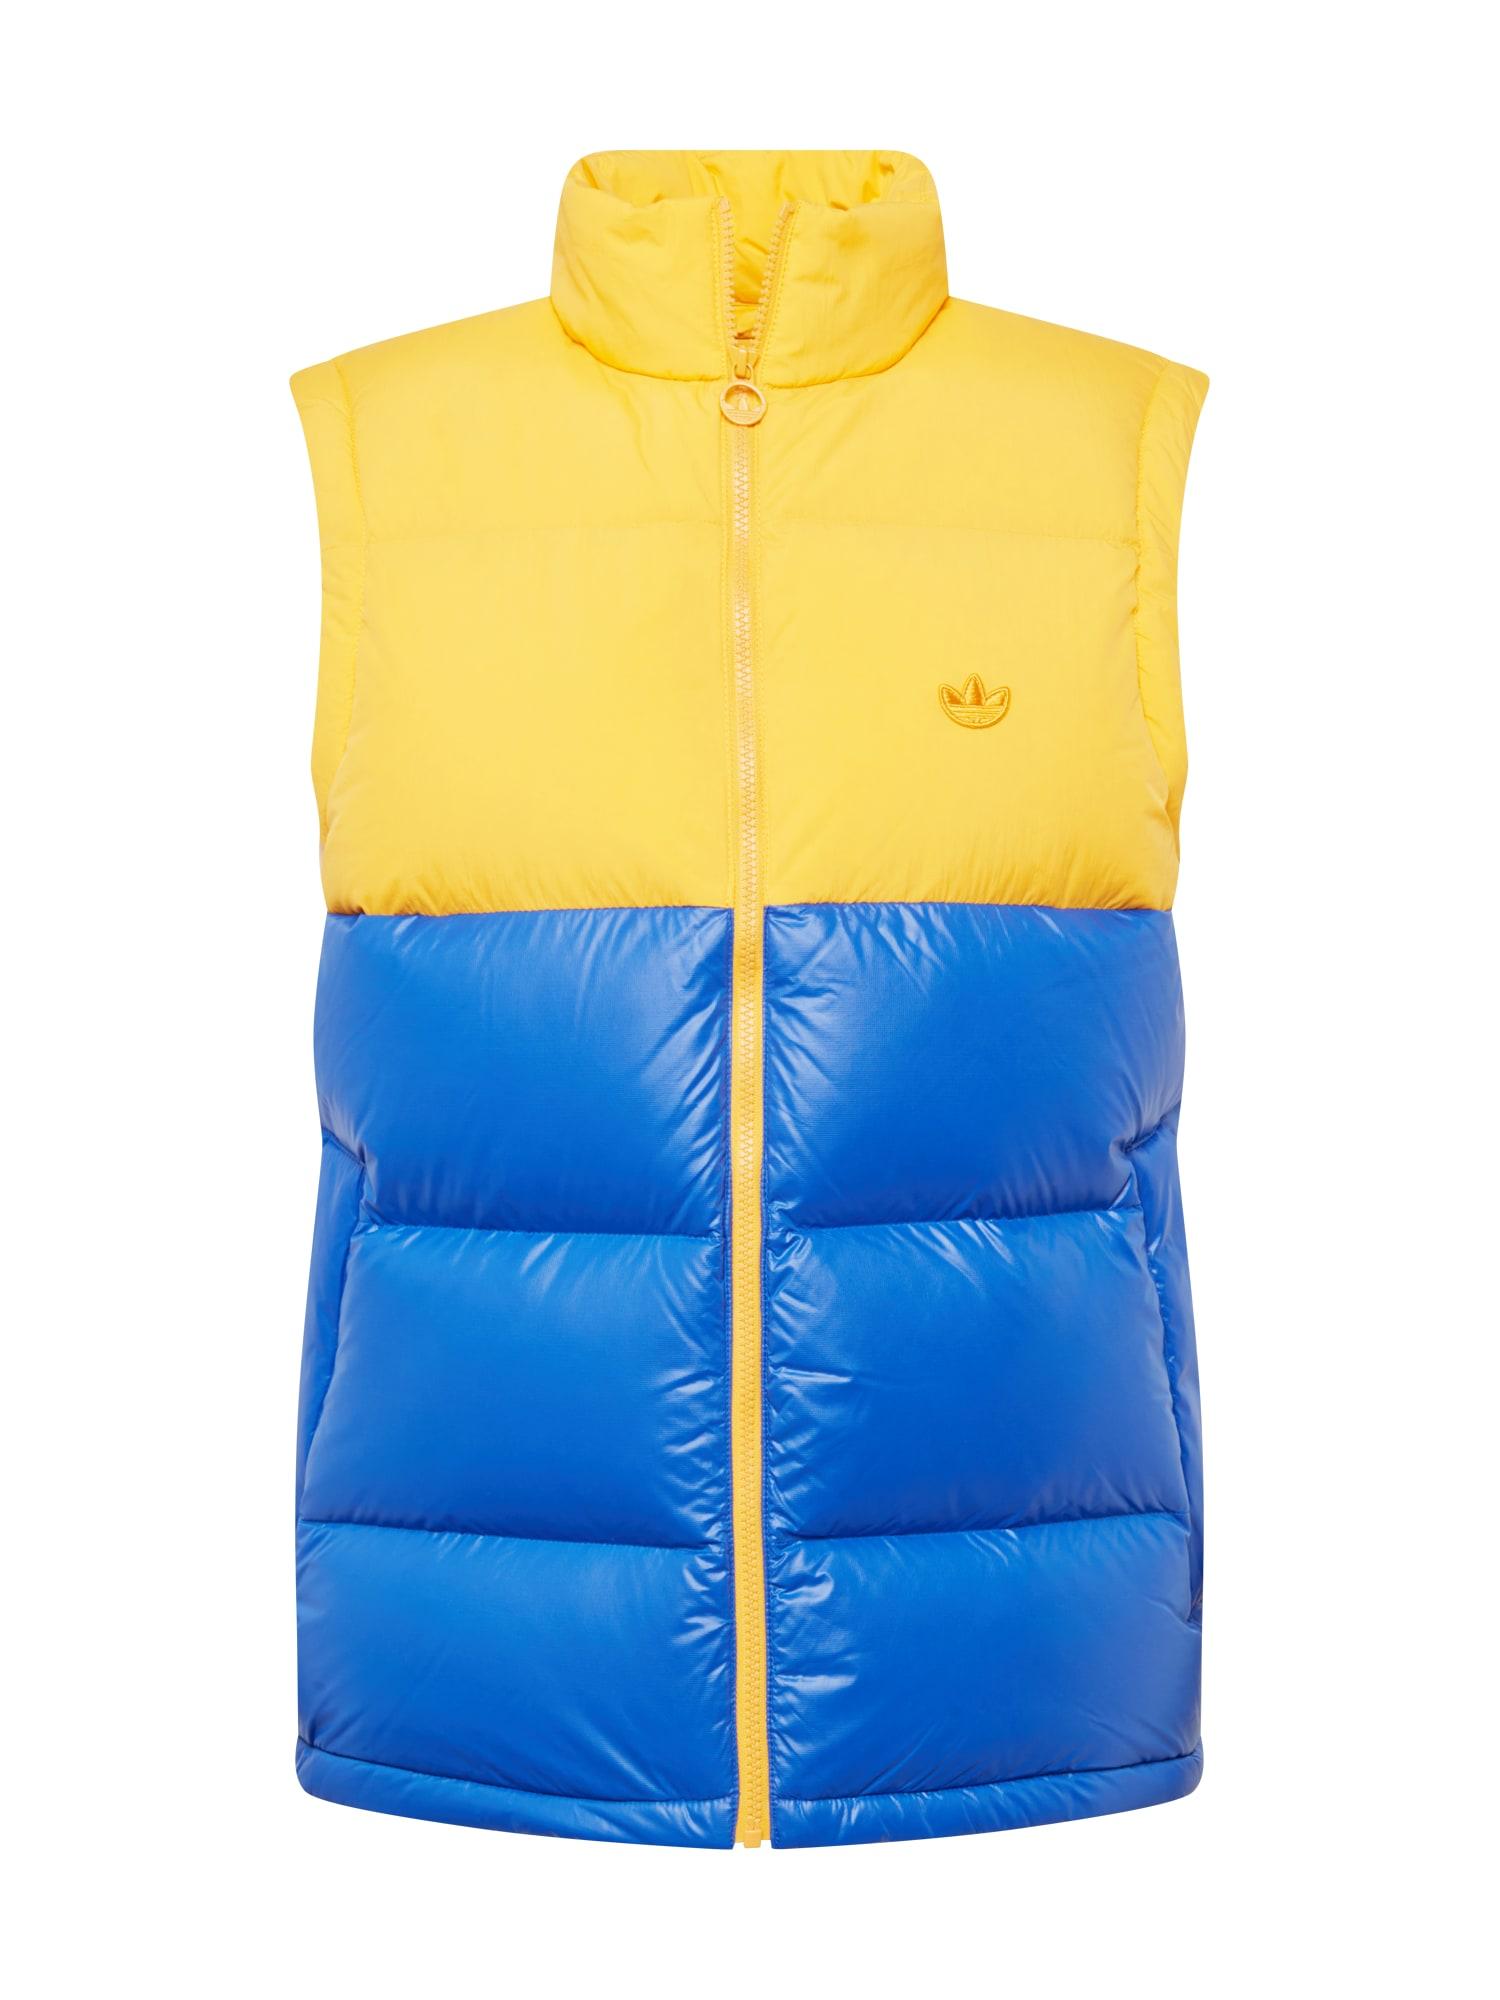 ADIDAS ORIGINALS Liemenė aukso geltonumo spalva / mėlyna